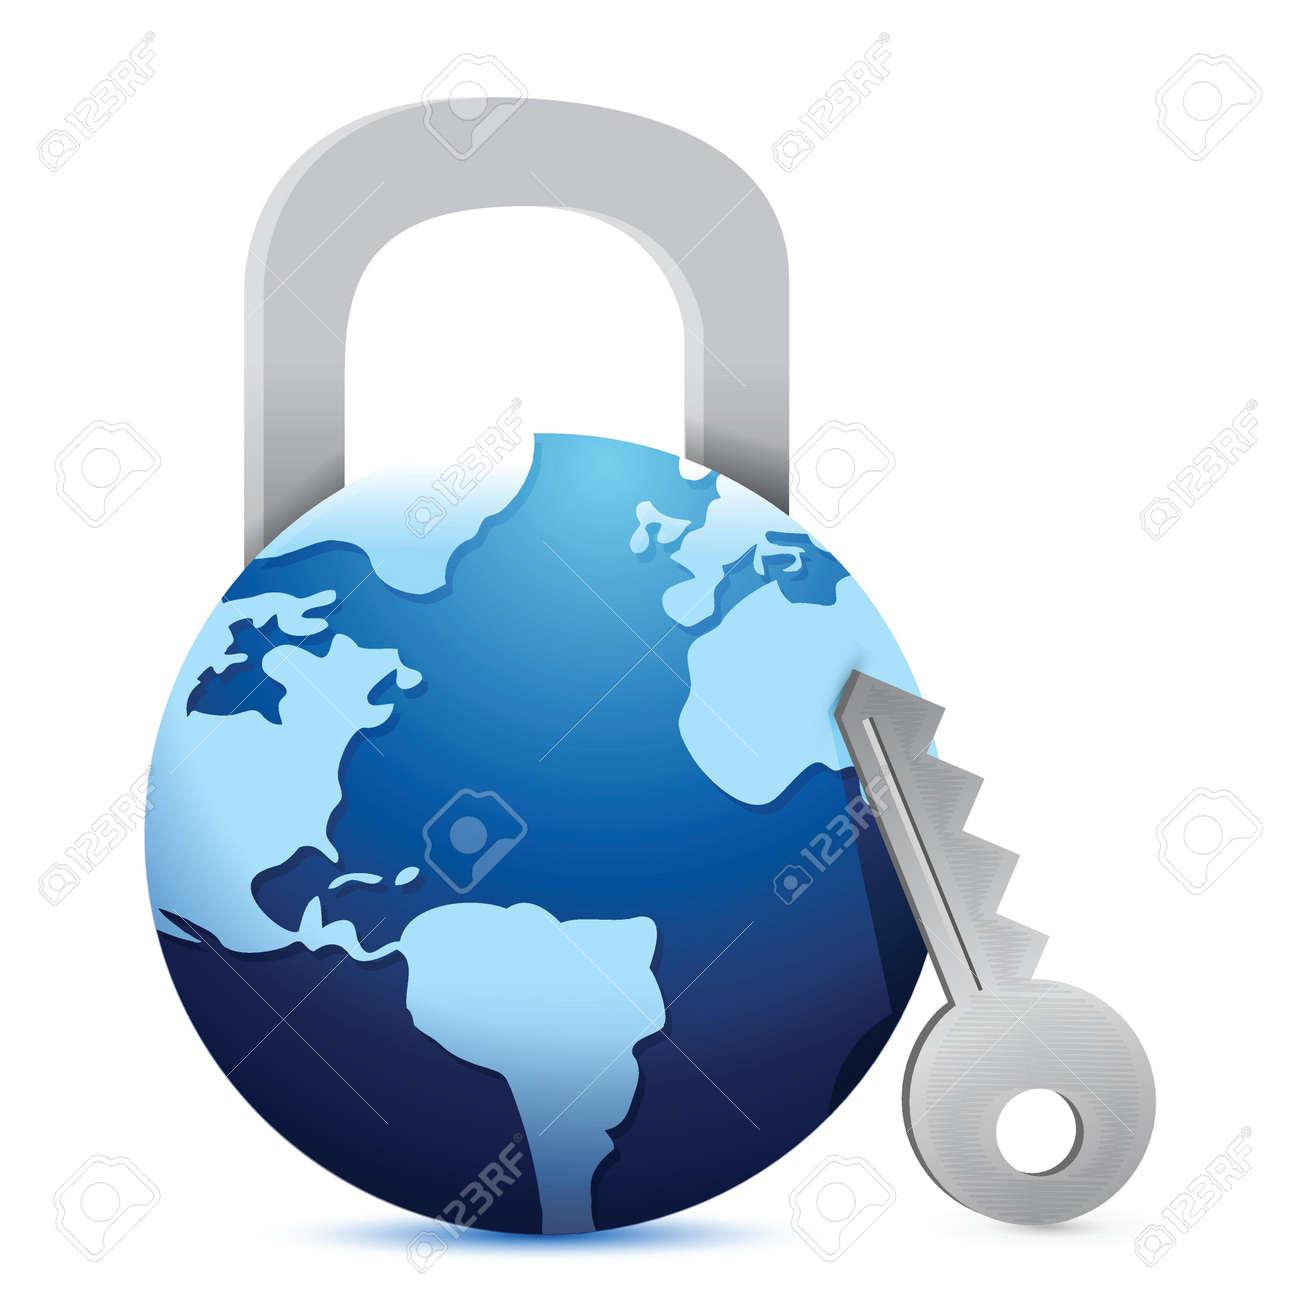 open globe 'lock' illustration design over a white background Stock Vector - 17594656